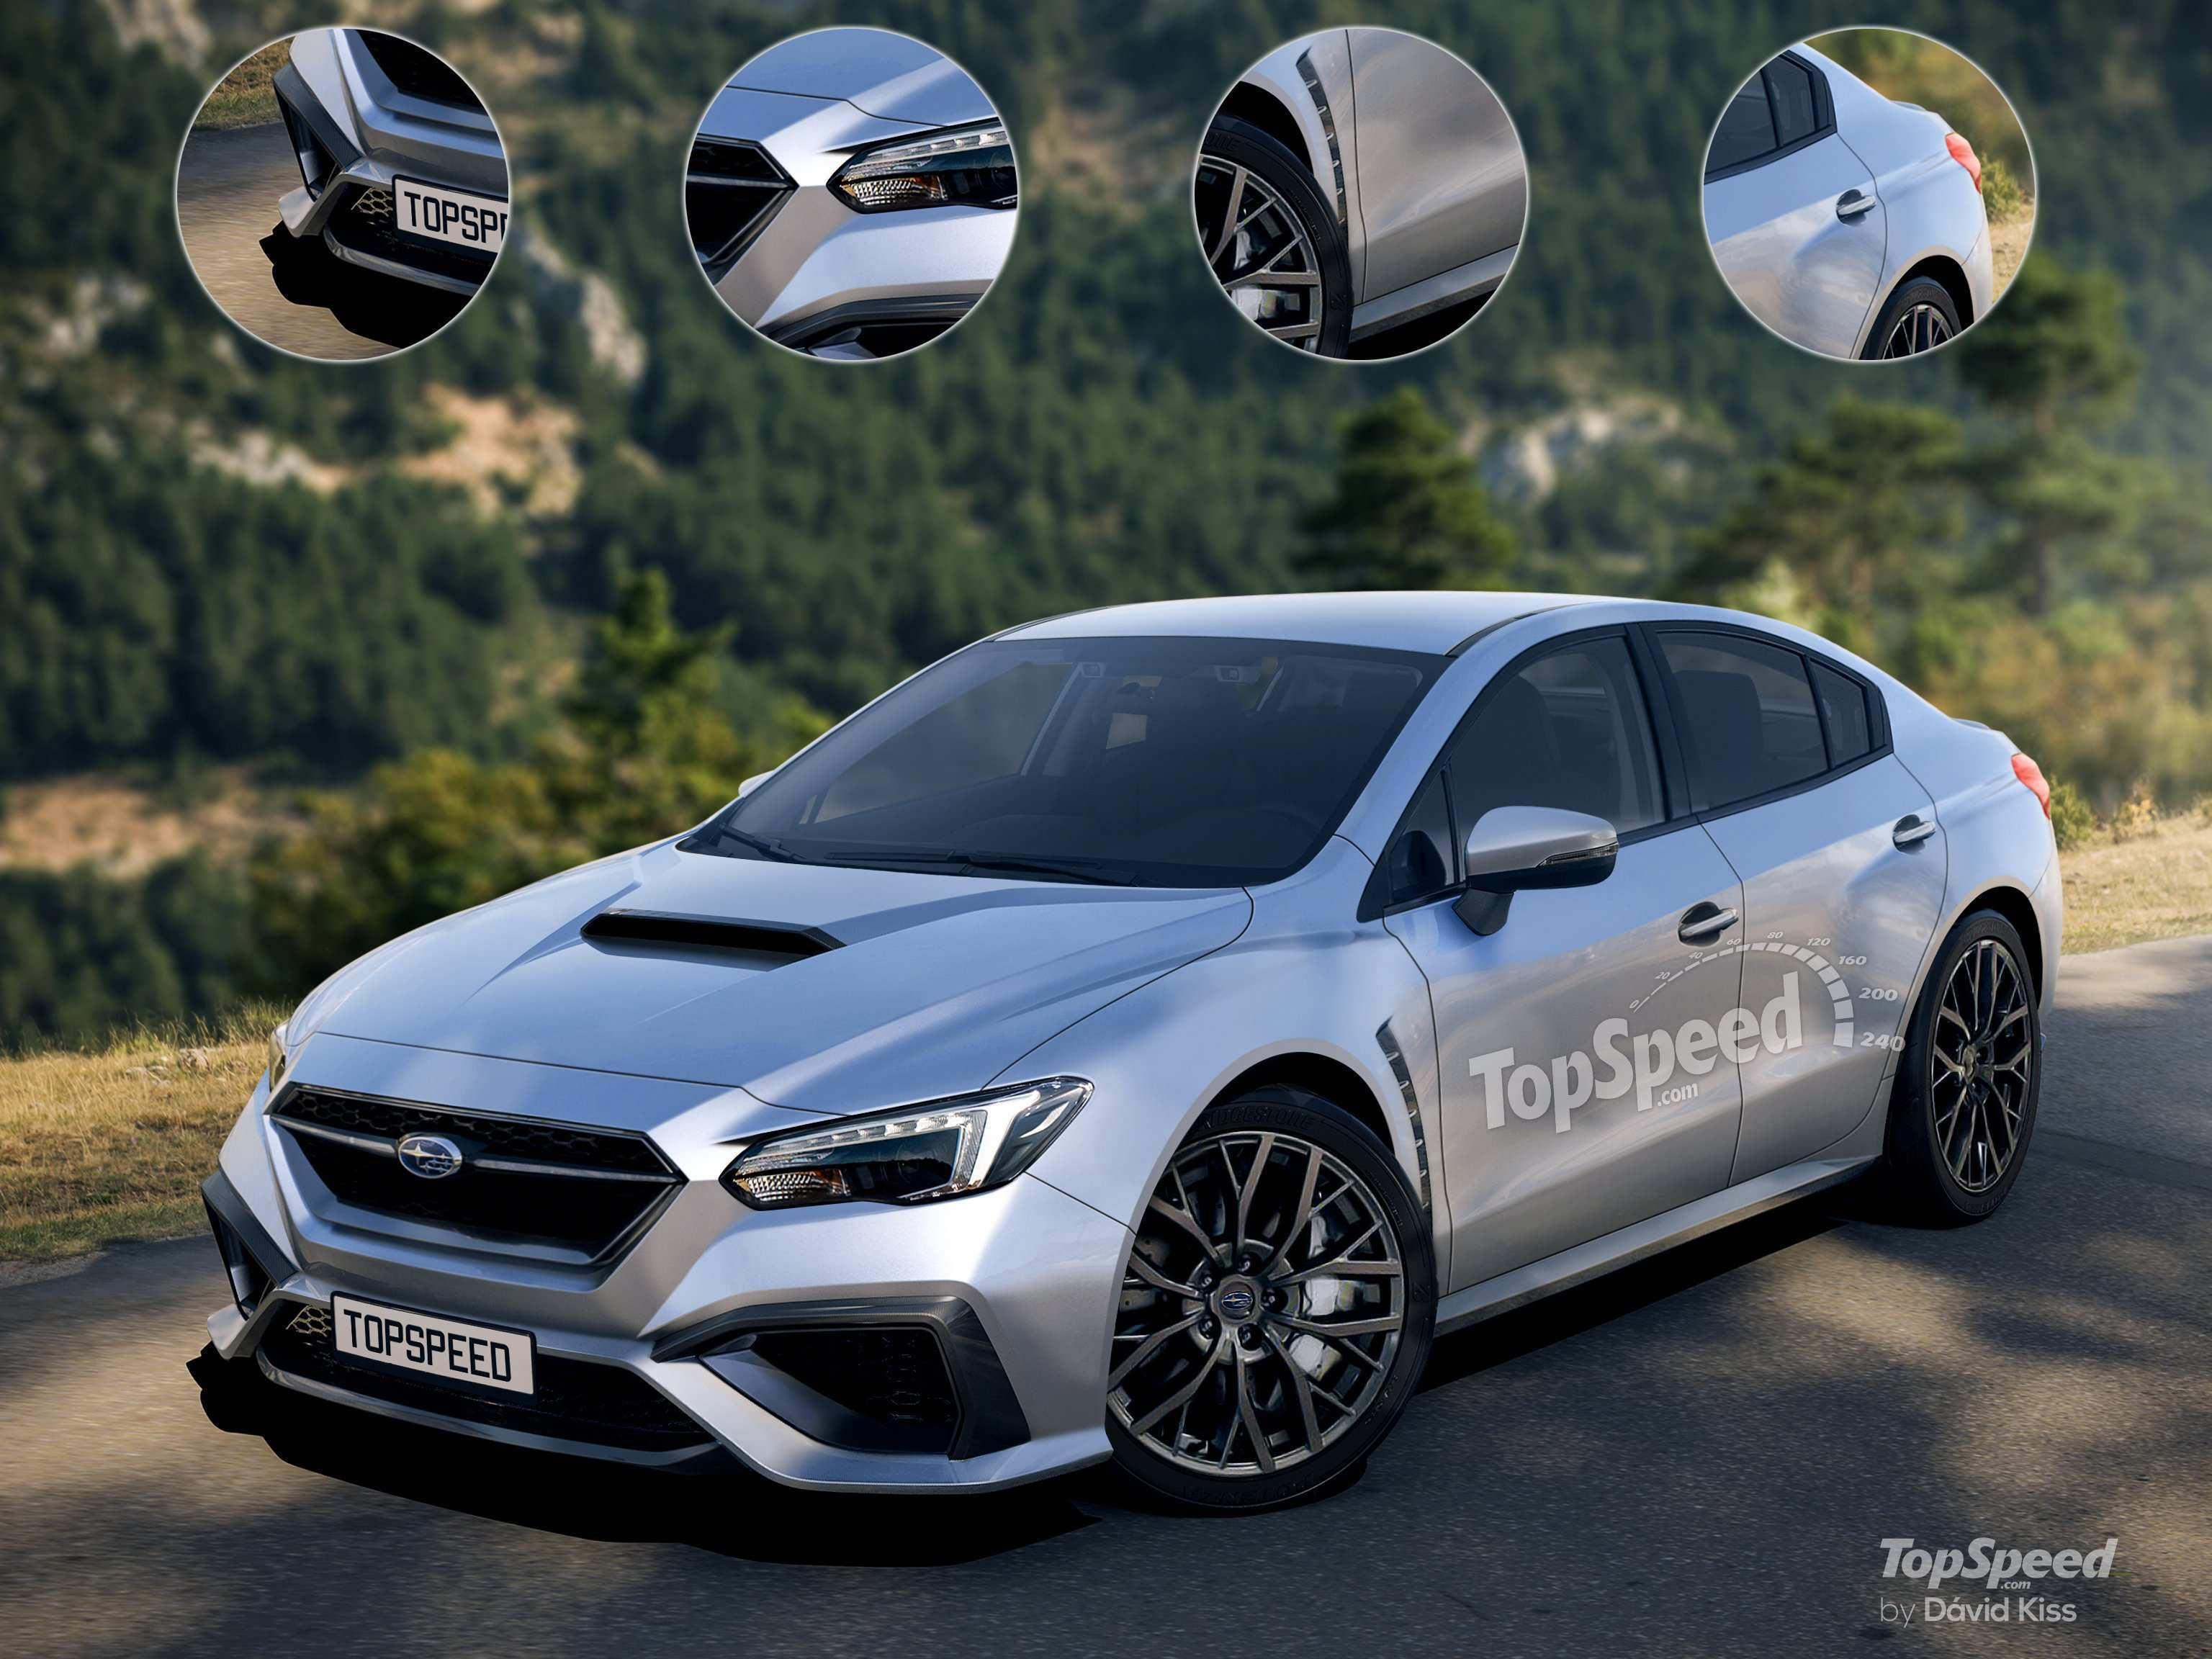 99 All New Subaru Sport 2020 Wallpaper with Subaru Sport 2020